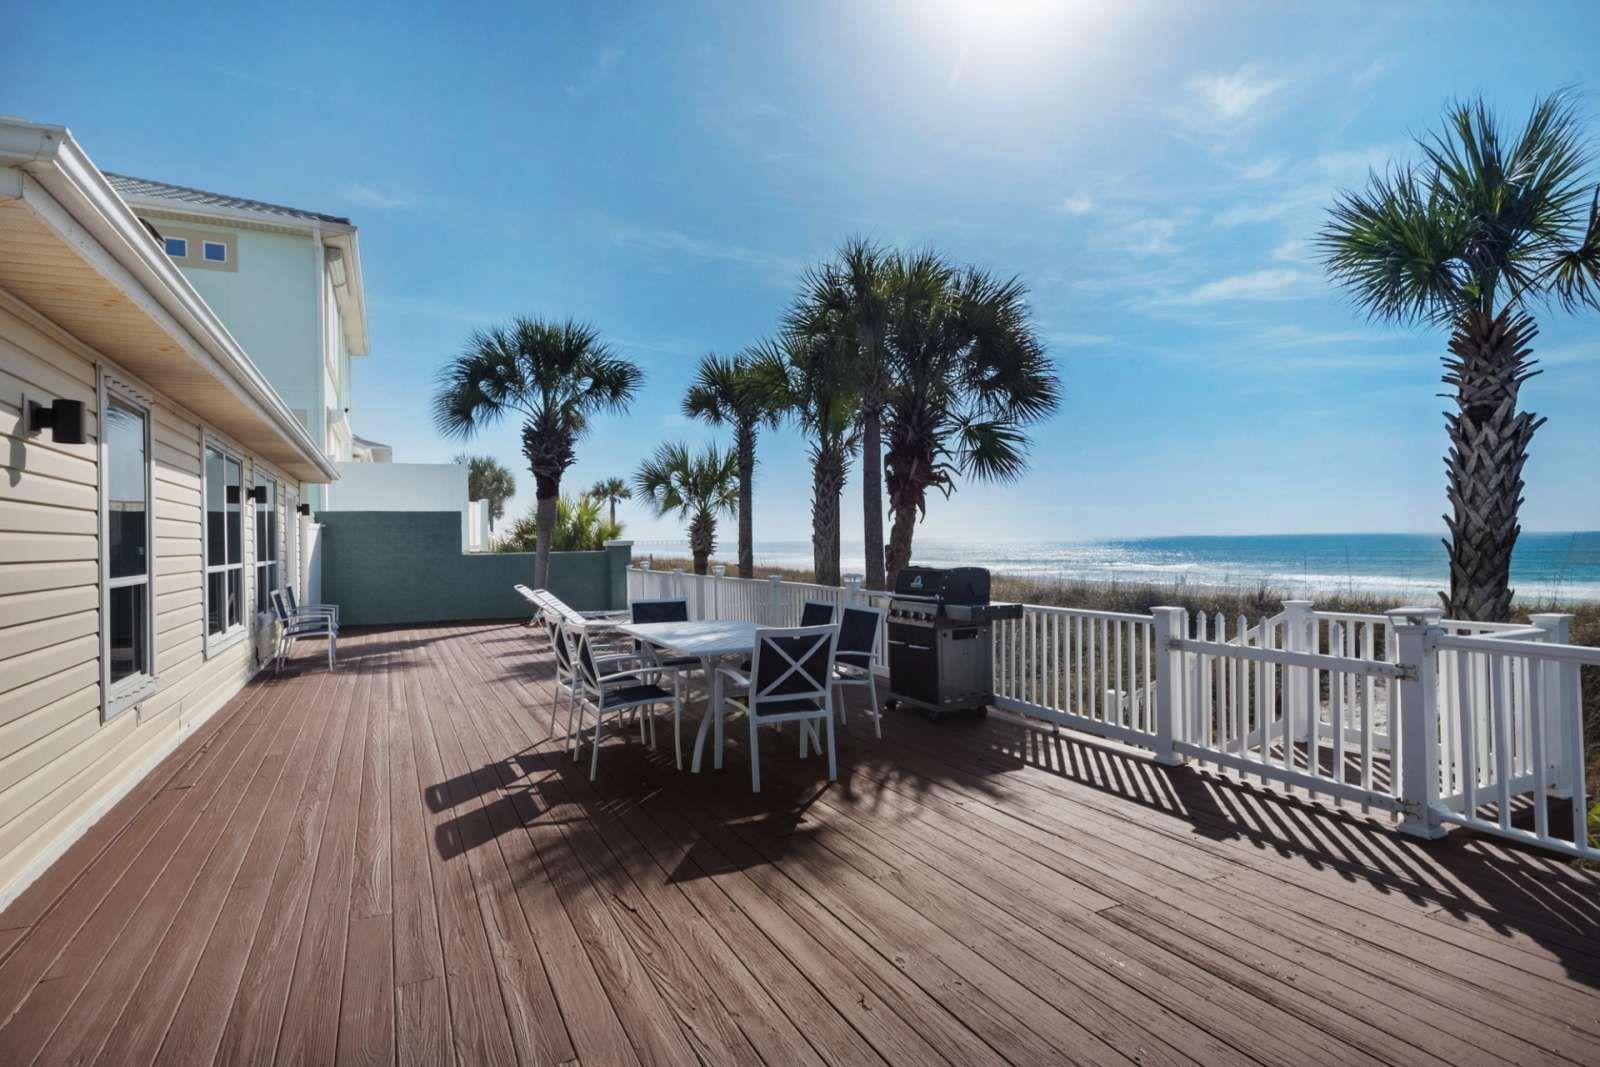 Panama City Beach Vacation Rental | Sun & Sand Beach ...